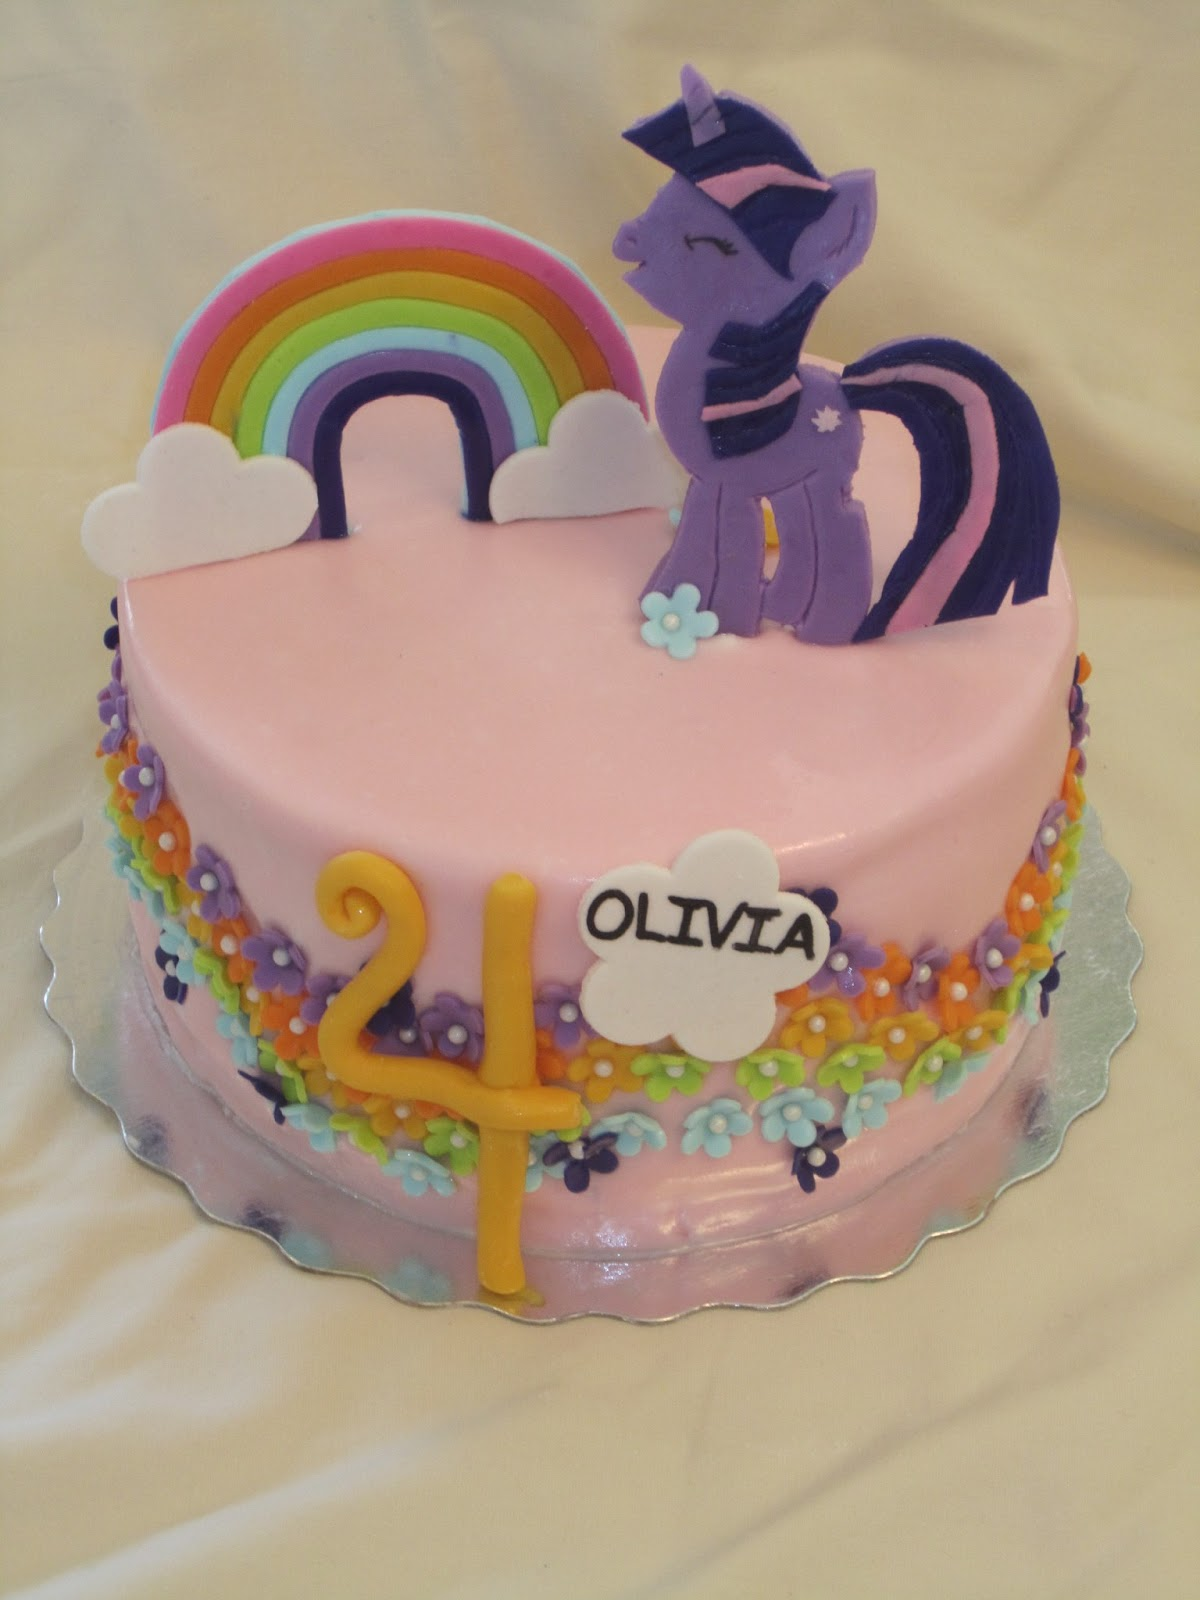 Cakesor Something Like That My Little Pony 4th Birthday Cake